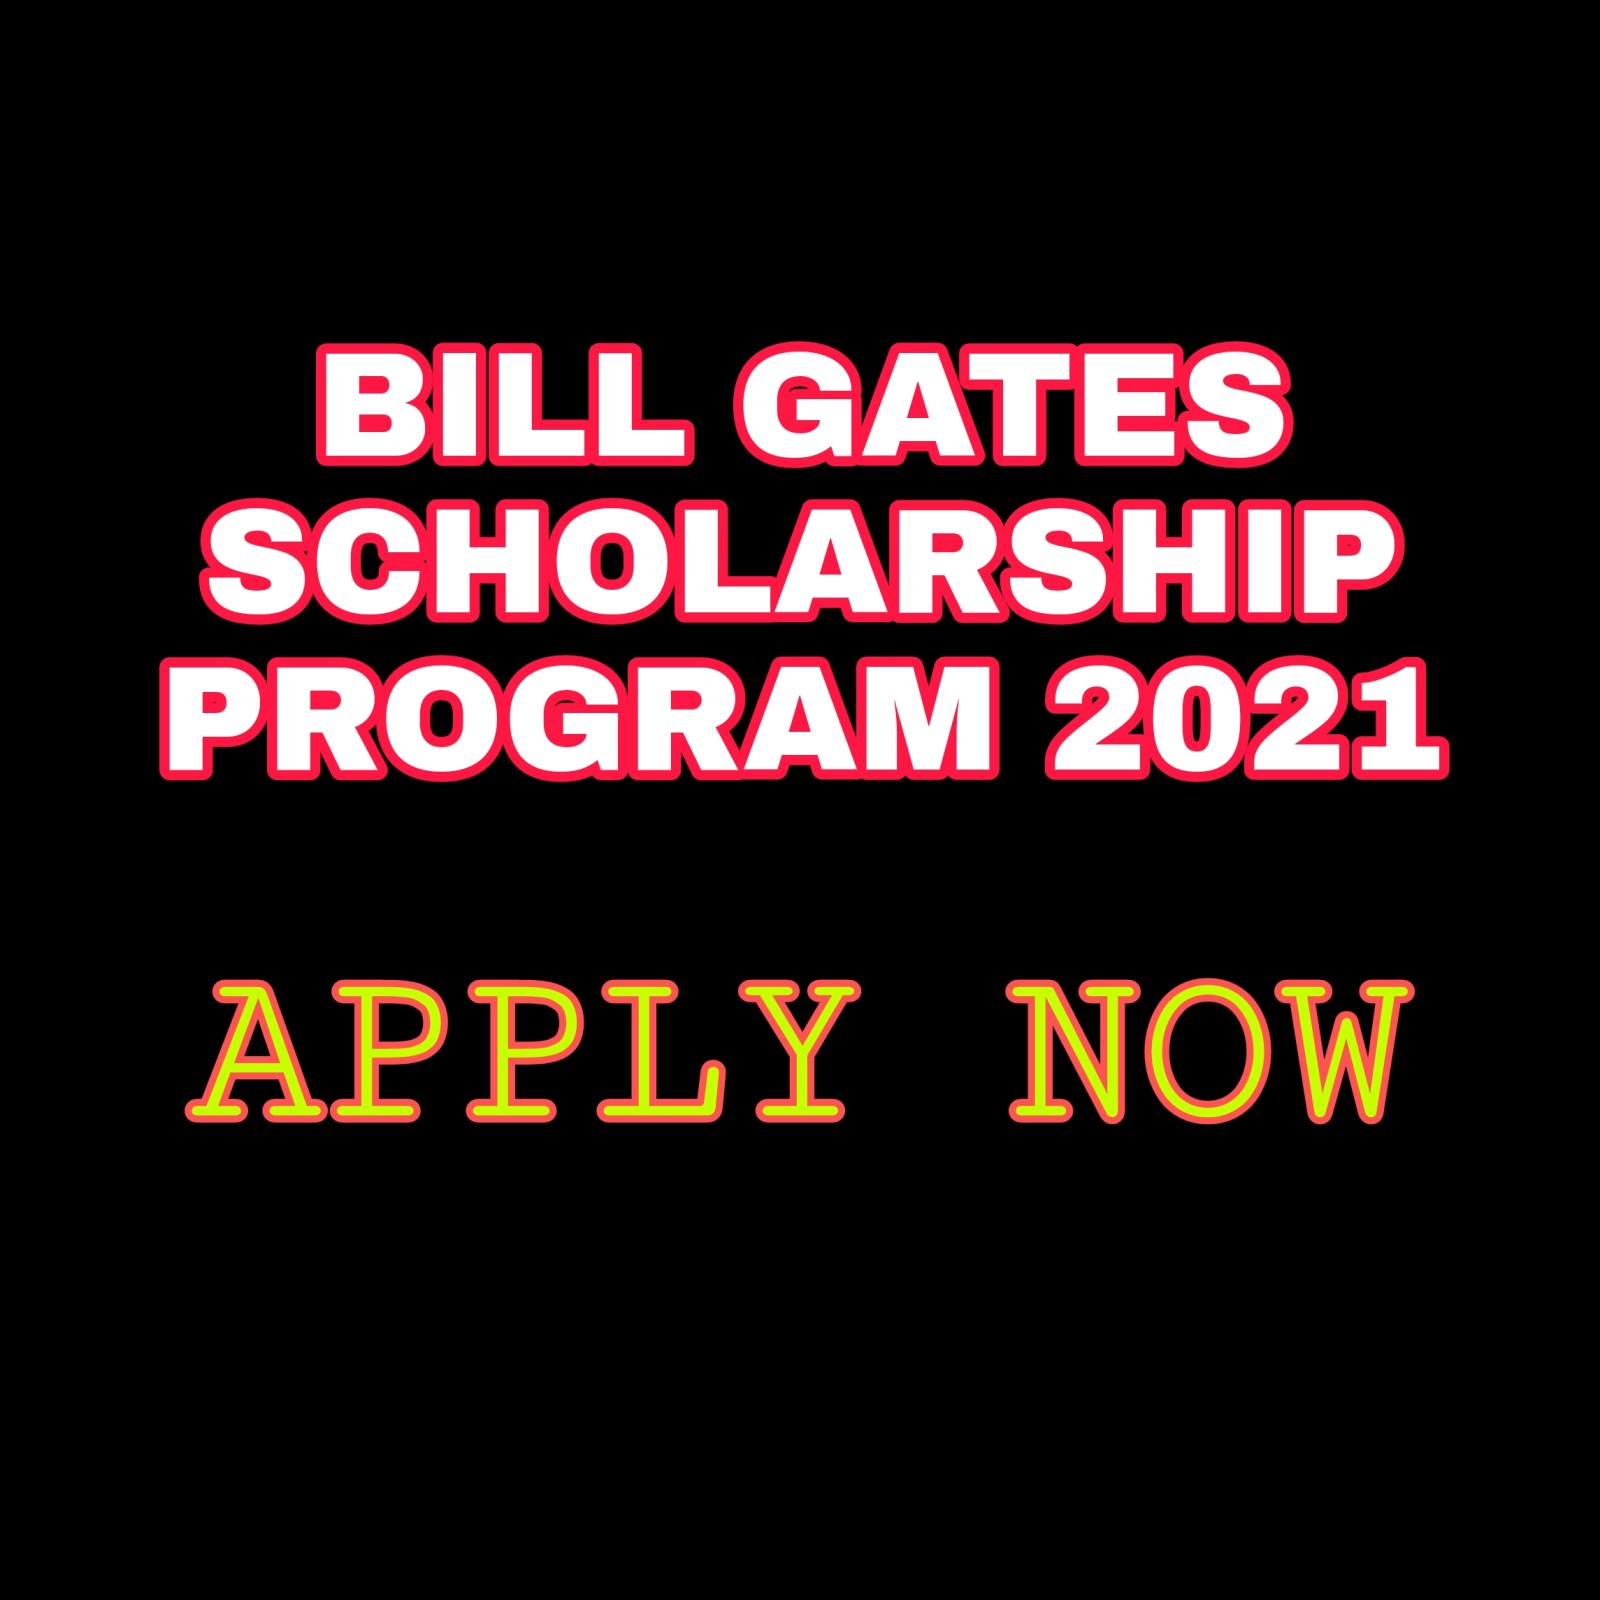 Bill Gates Scholarship Program 2021 - Fully Funded